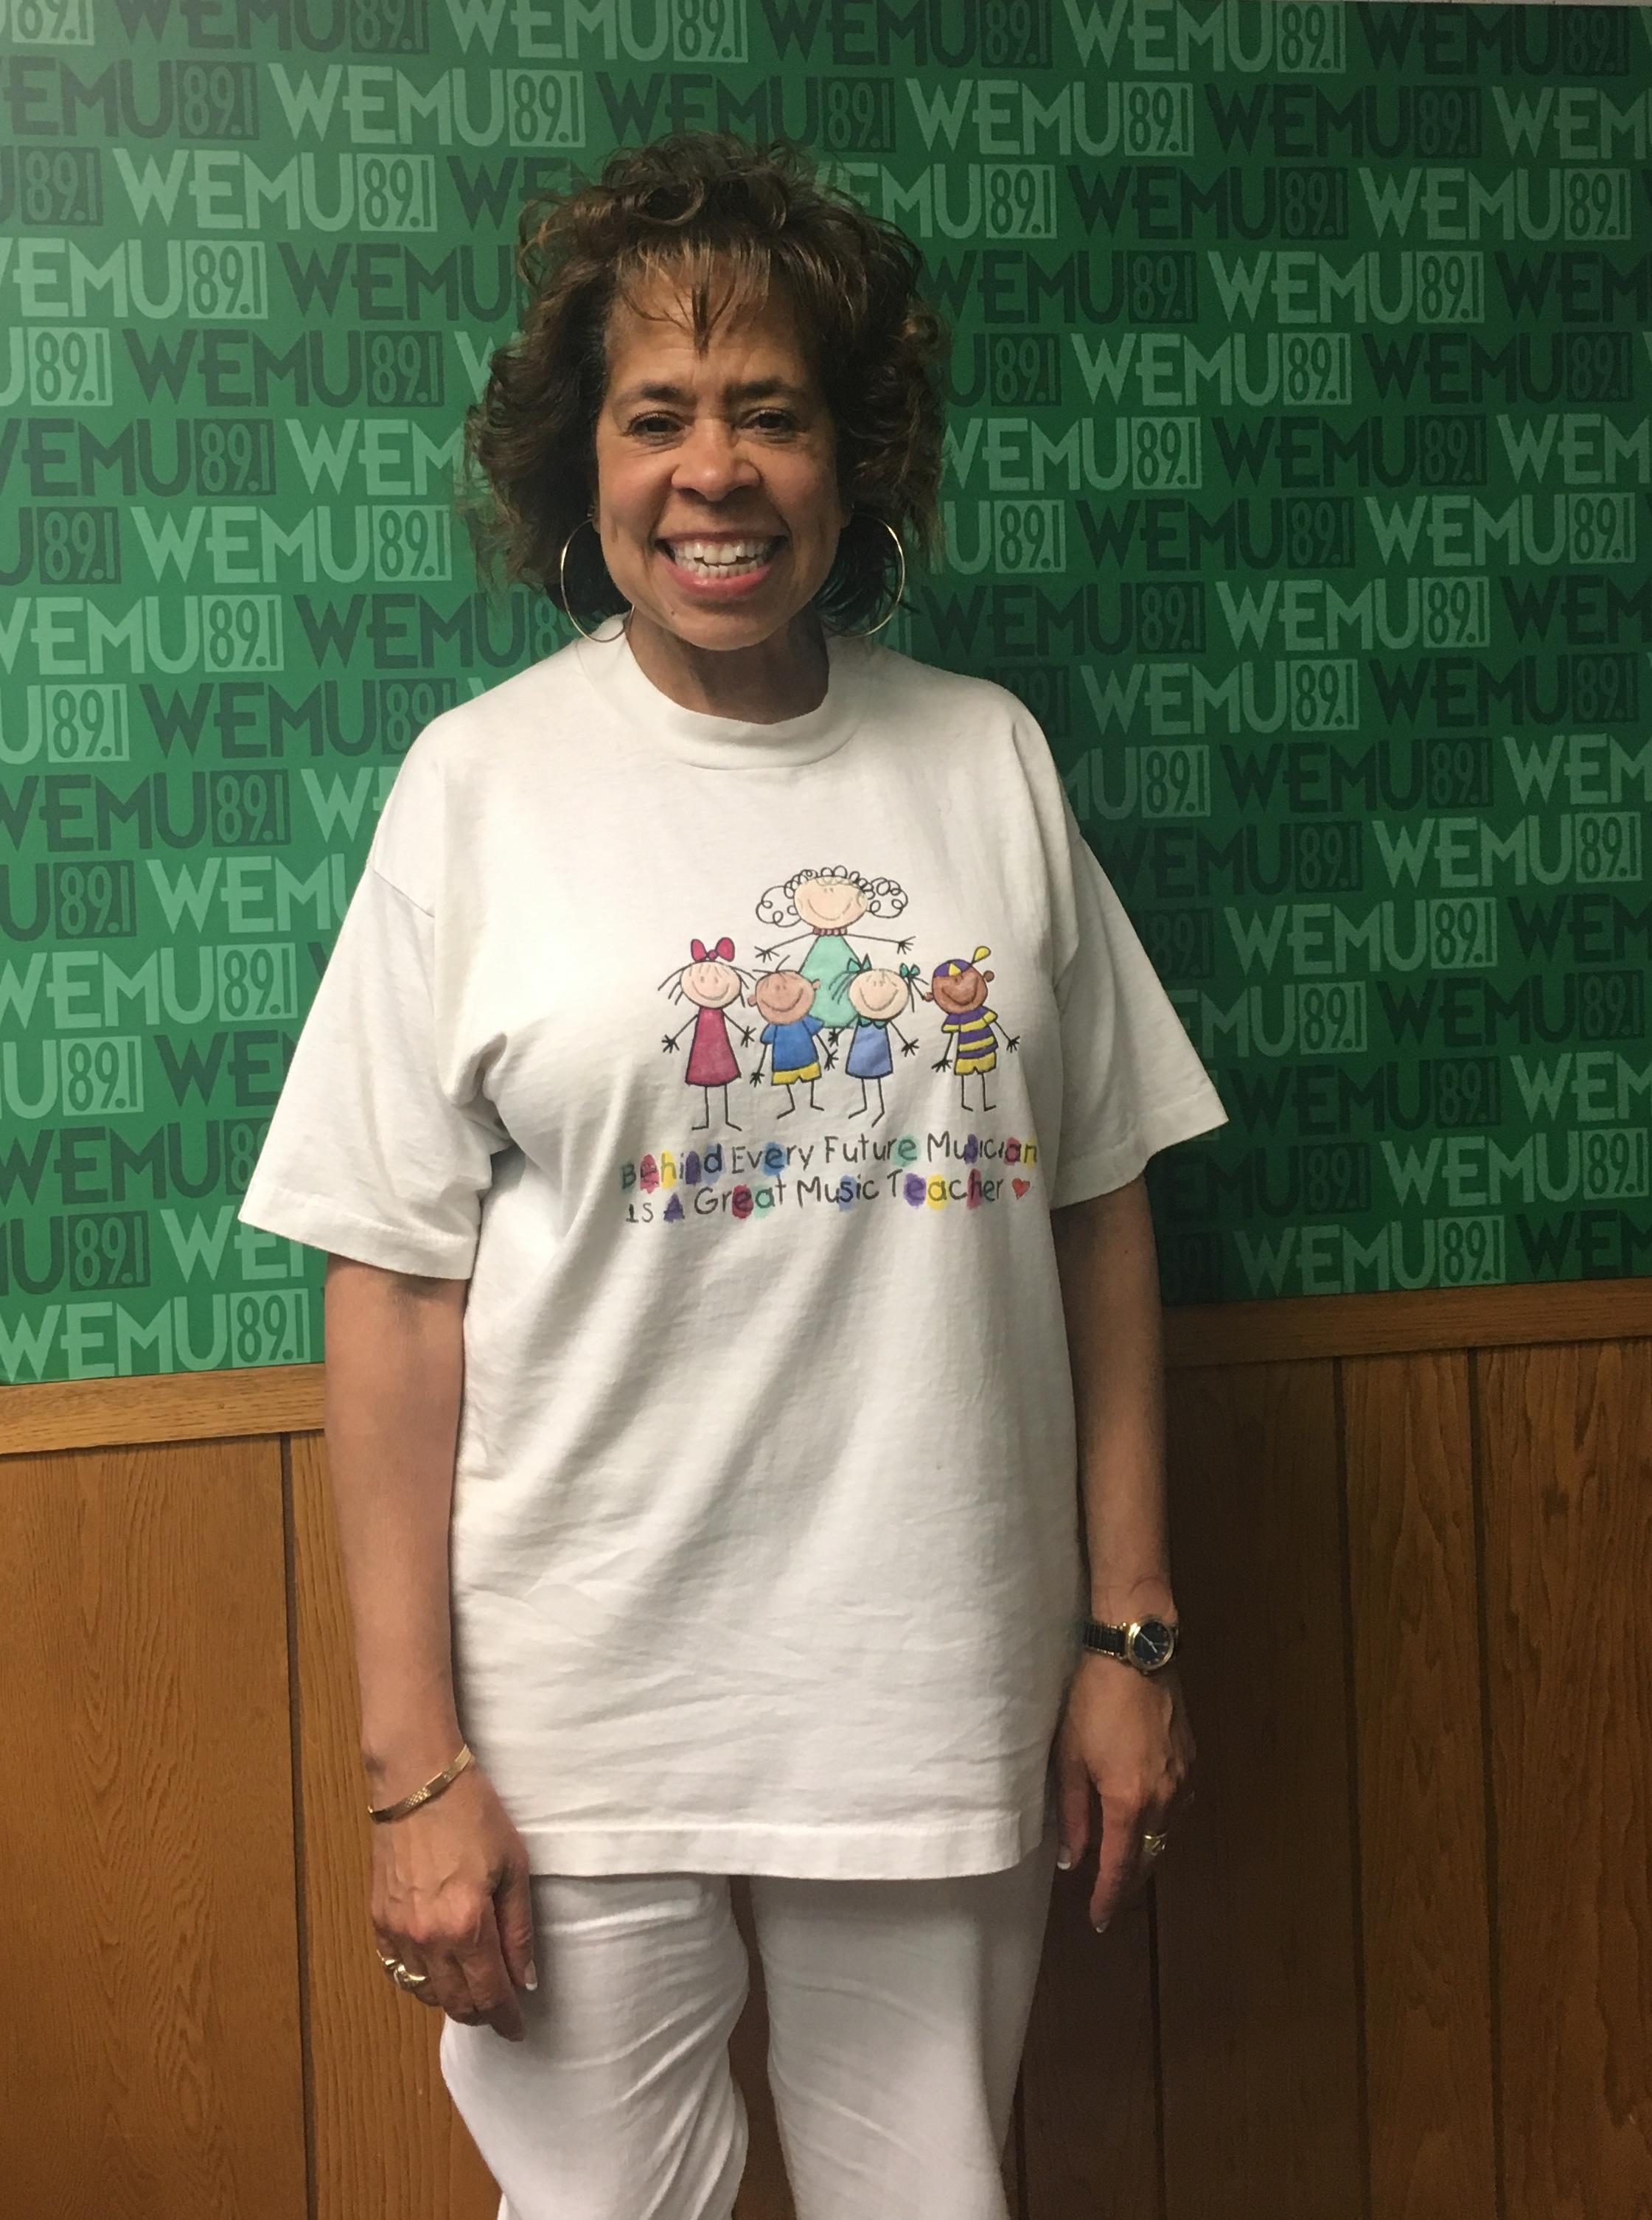 Teachers Union Leader We Wont Work With >> Linda Carter It Was A Labor Of Love For Retiring Ann Arbor Teacher